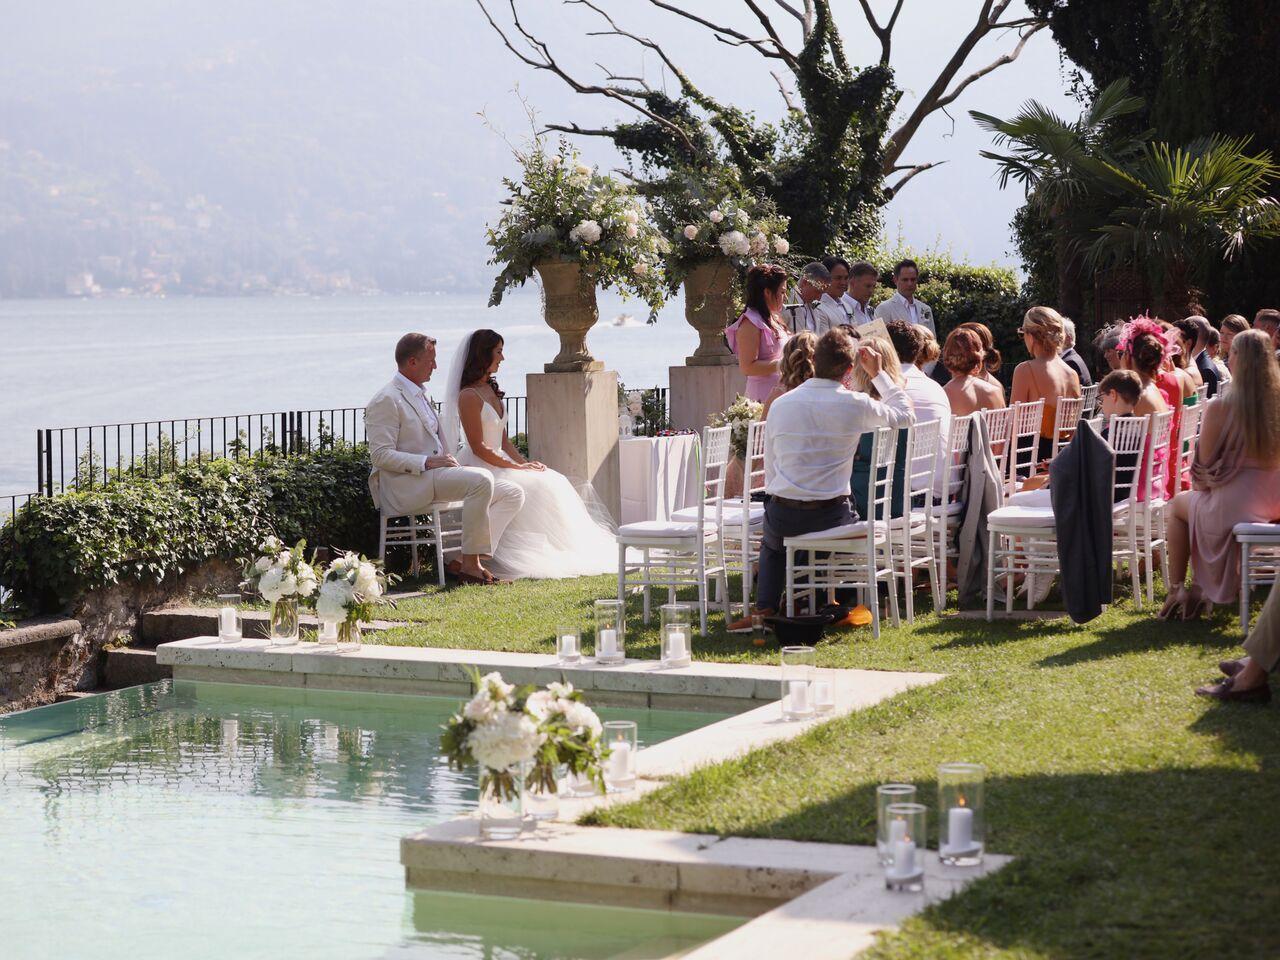 Rachael & Duncan's Italian Wedding featured on LOVE FIND CO.